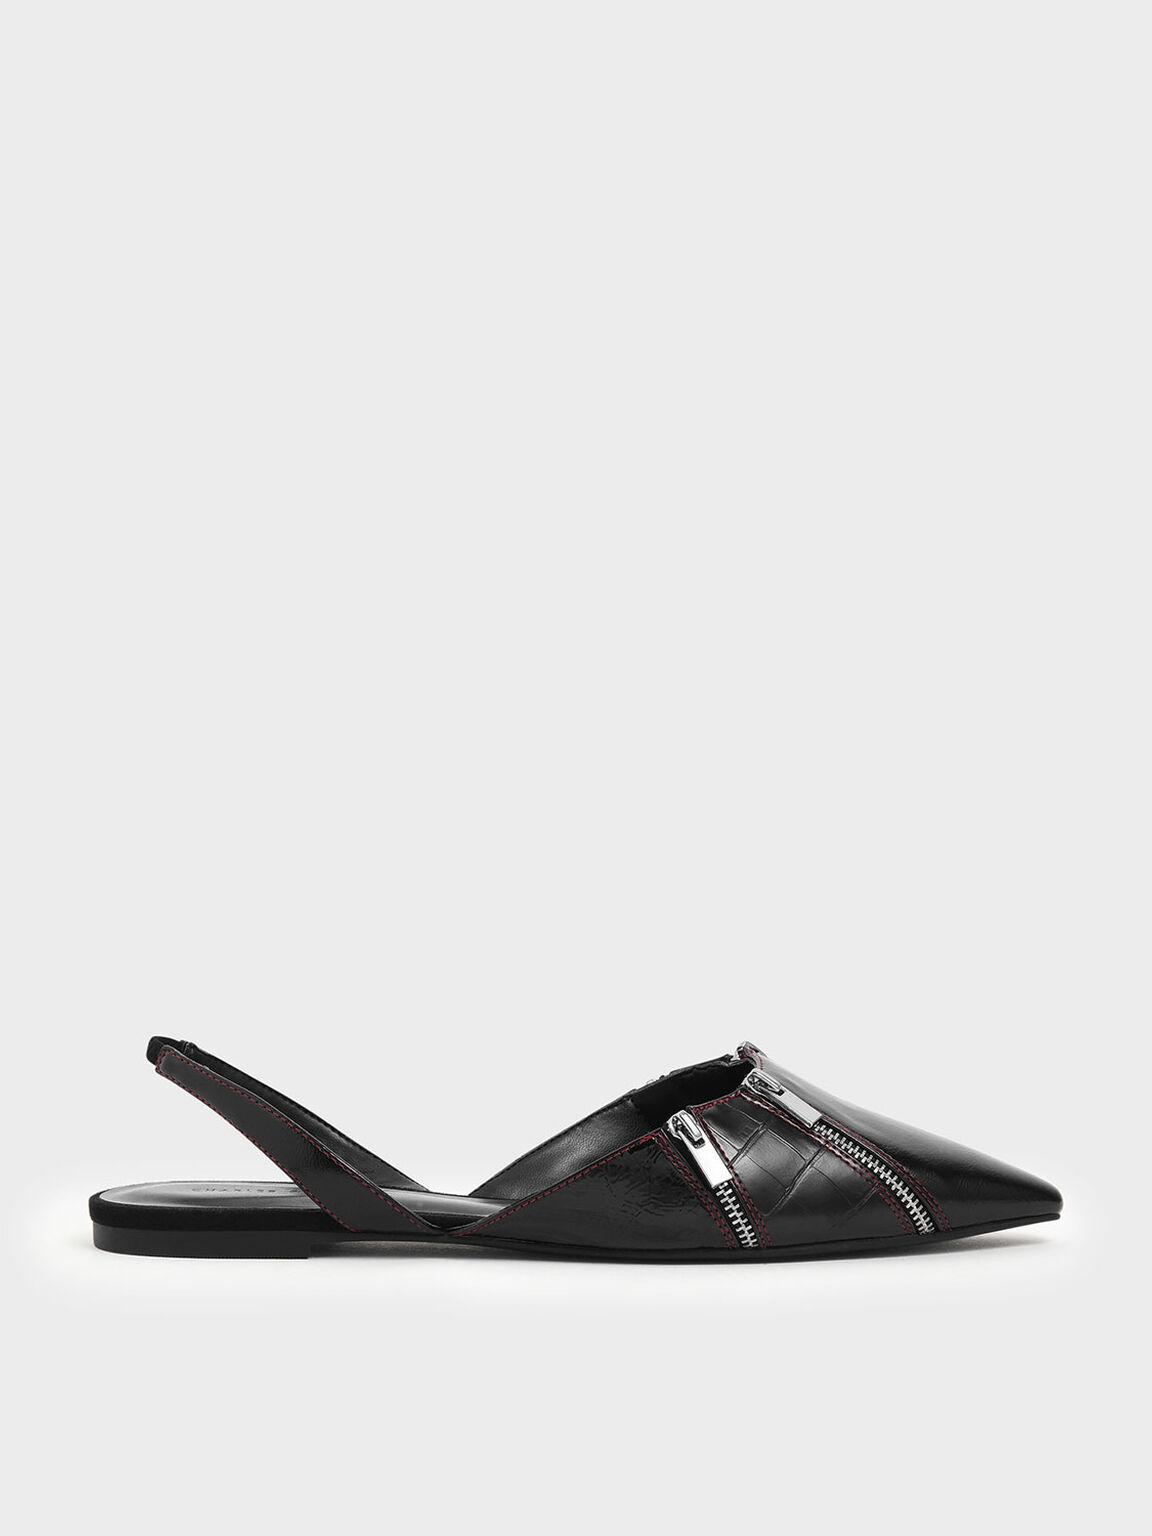 Wrinkled Patent Zip Detail Pointed Toe Slingback Flats, Black, hi-res